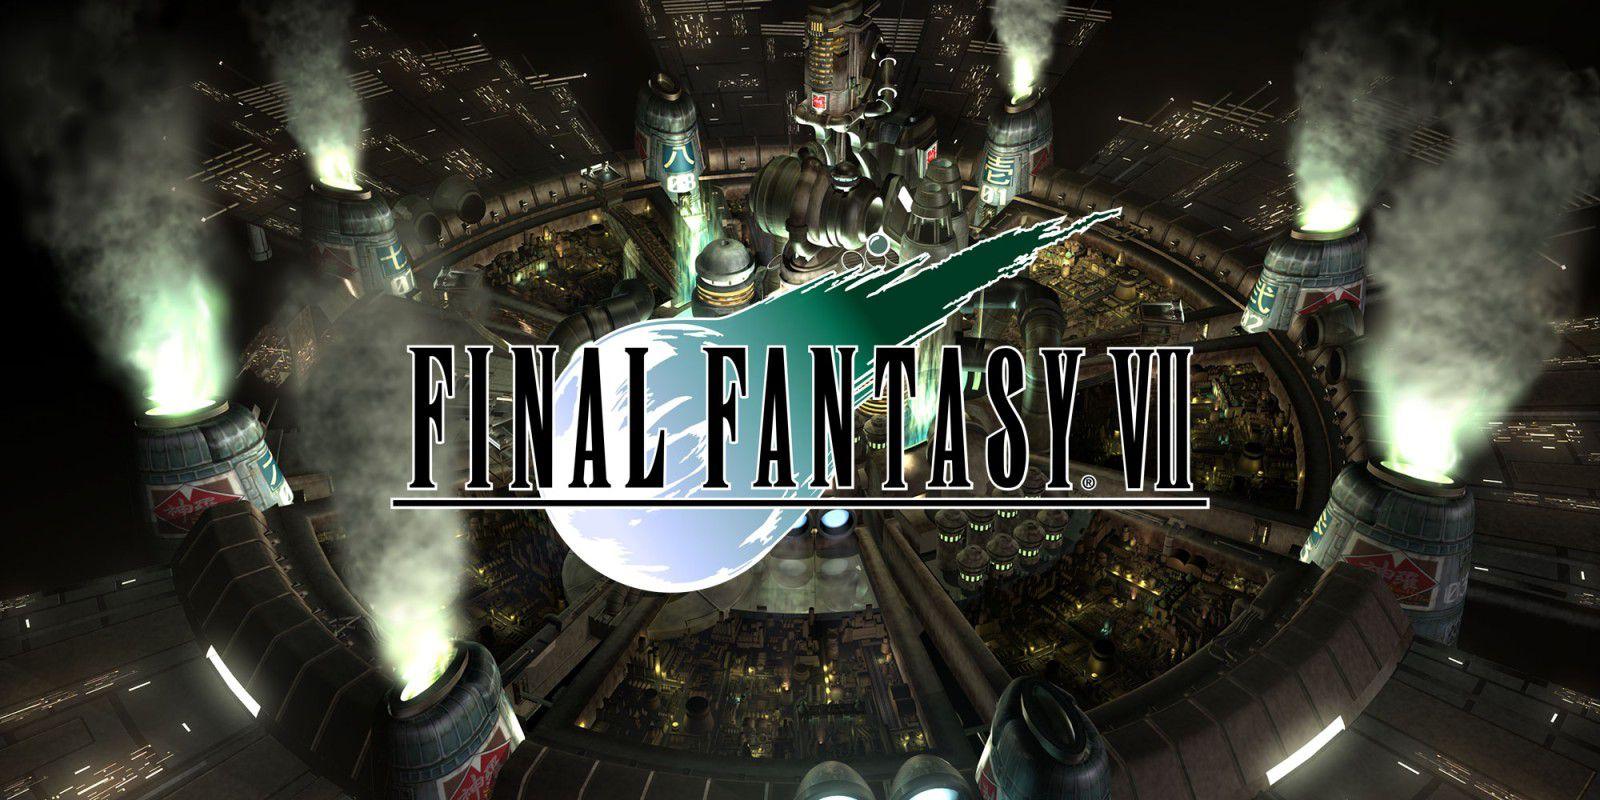 final fantasy vii formula mito intramontabile v20 47560 - Back 2 the past - Final Fantasy VII, un cult del medium